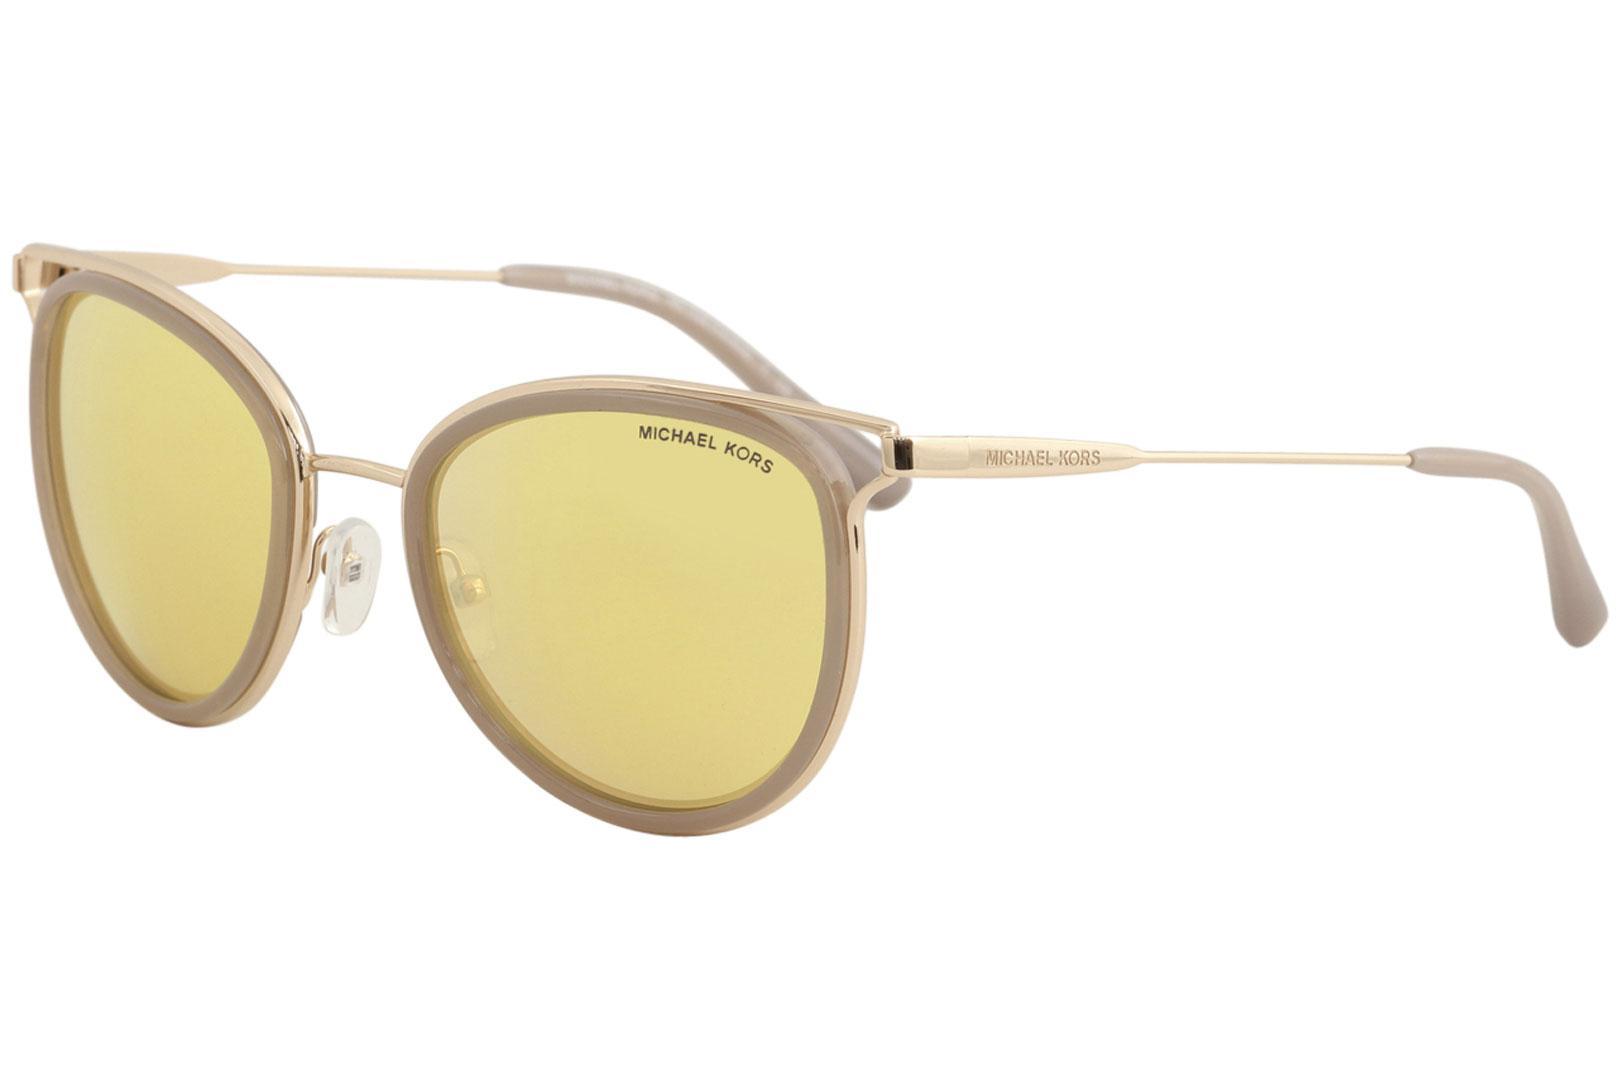 2fff6a030e Michael Kors Women s Havana MK1025 MK 1025 Fashion Round Sunglasses by Michael  Kors. Touch to zoom